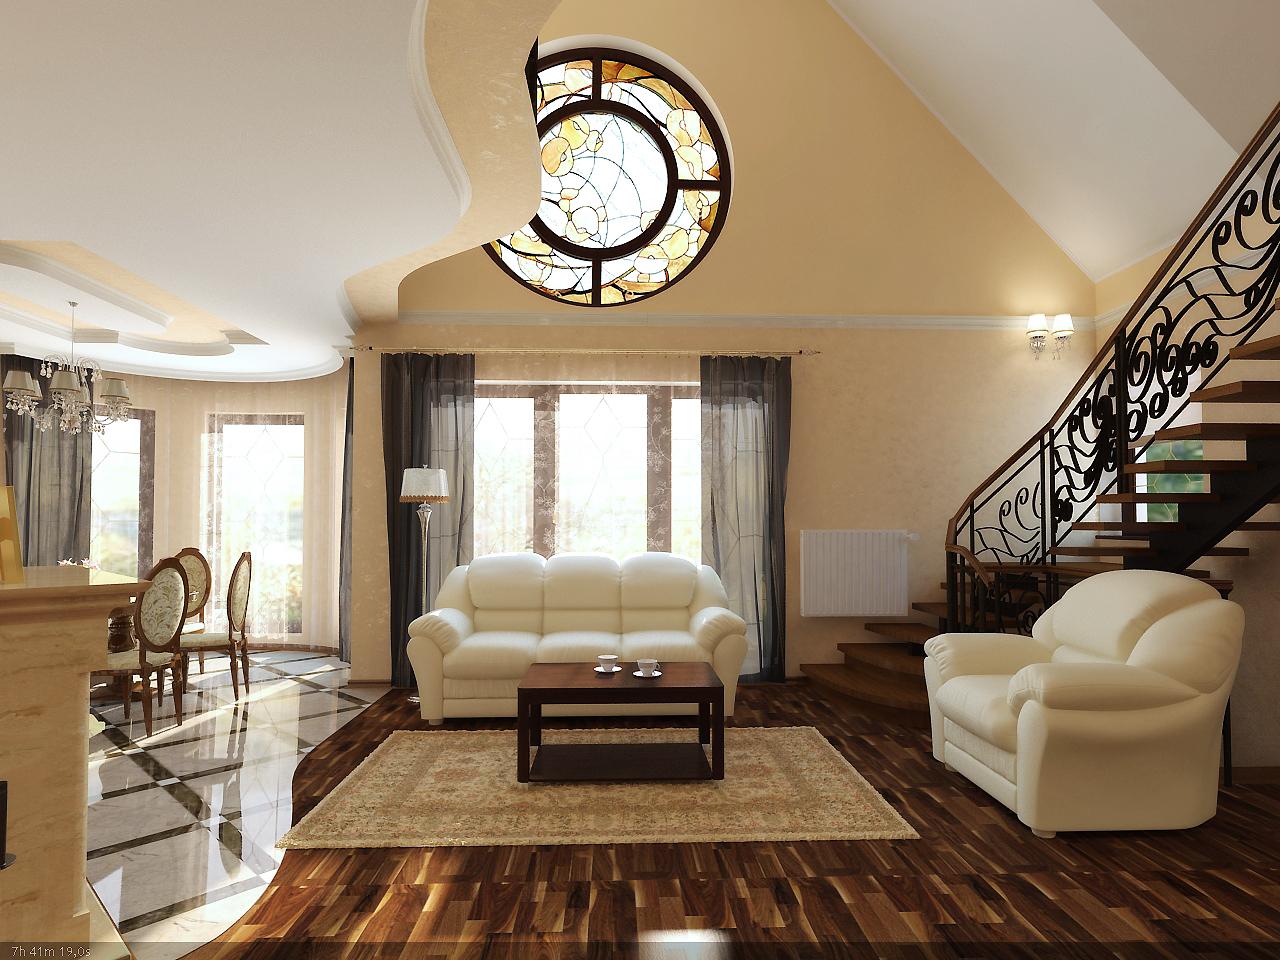 002a6-interior-design-ideas.jpg